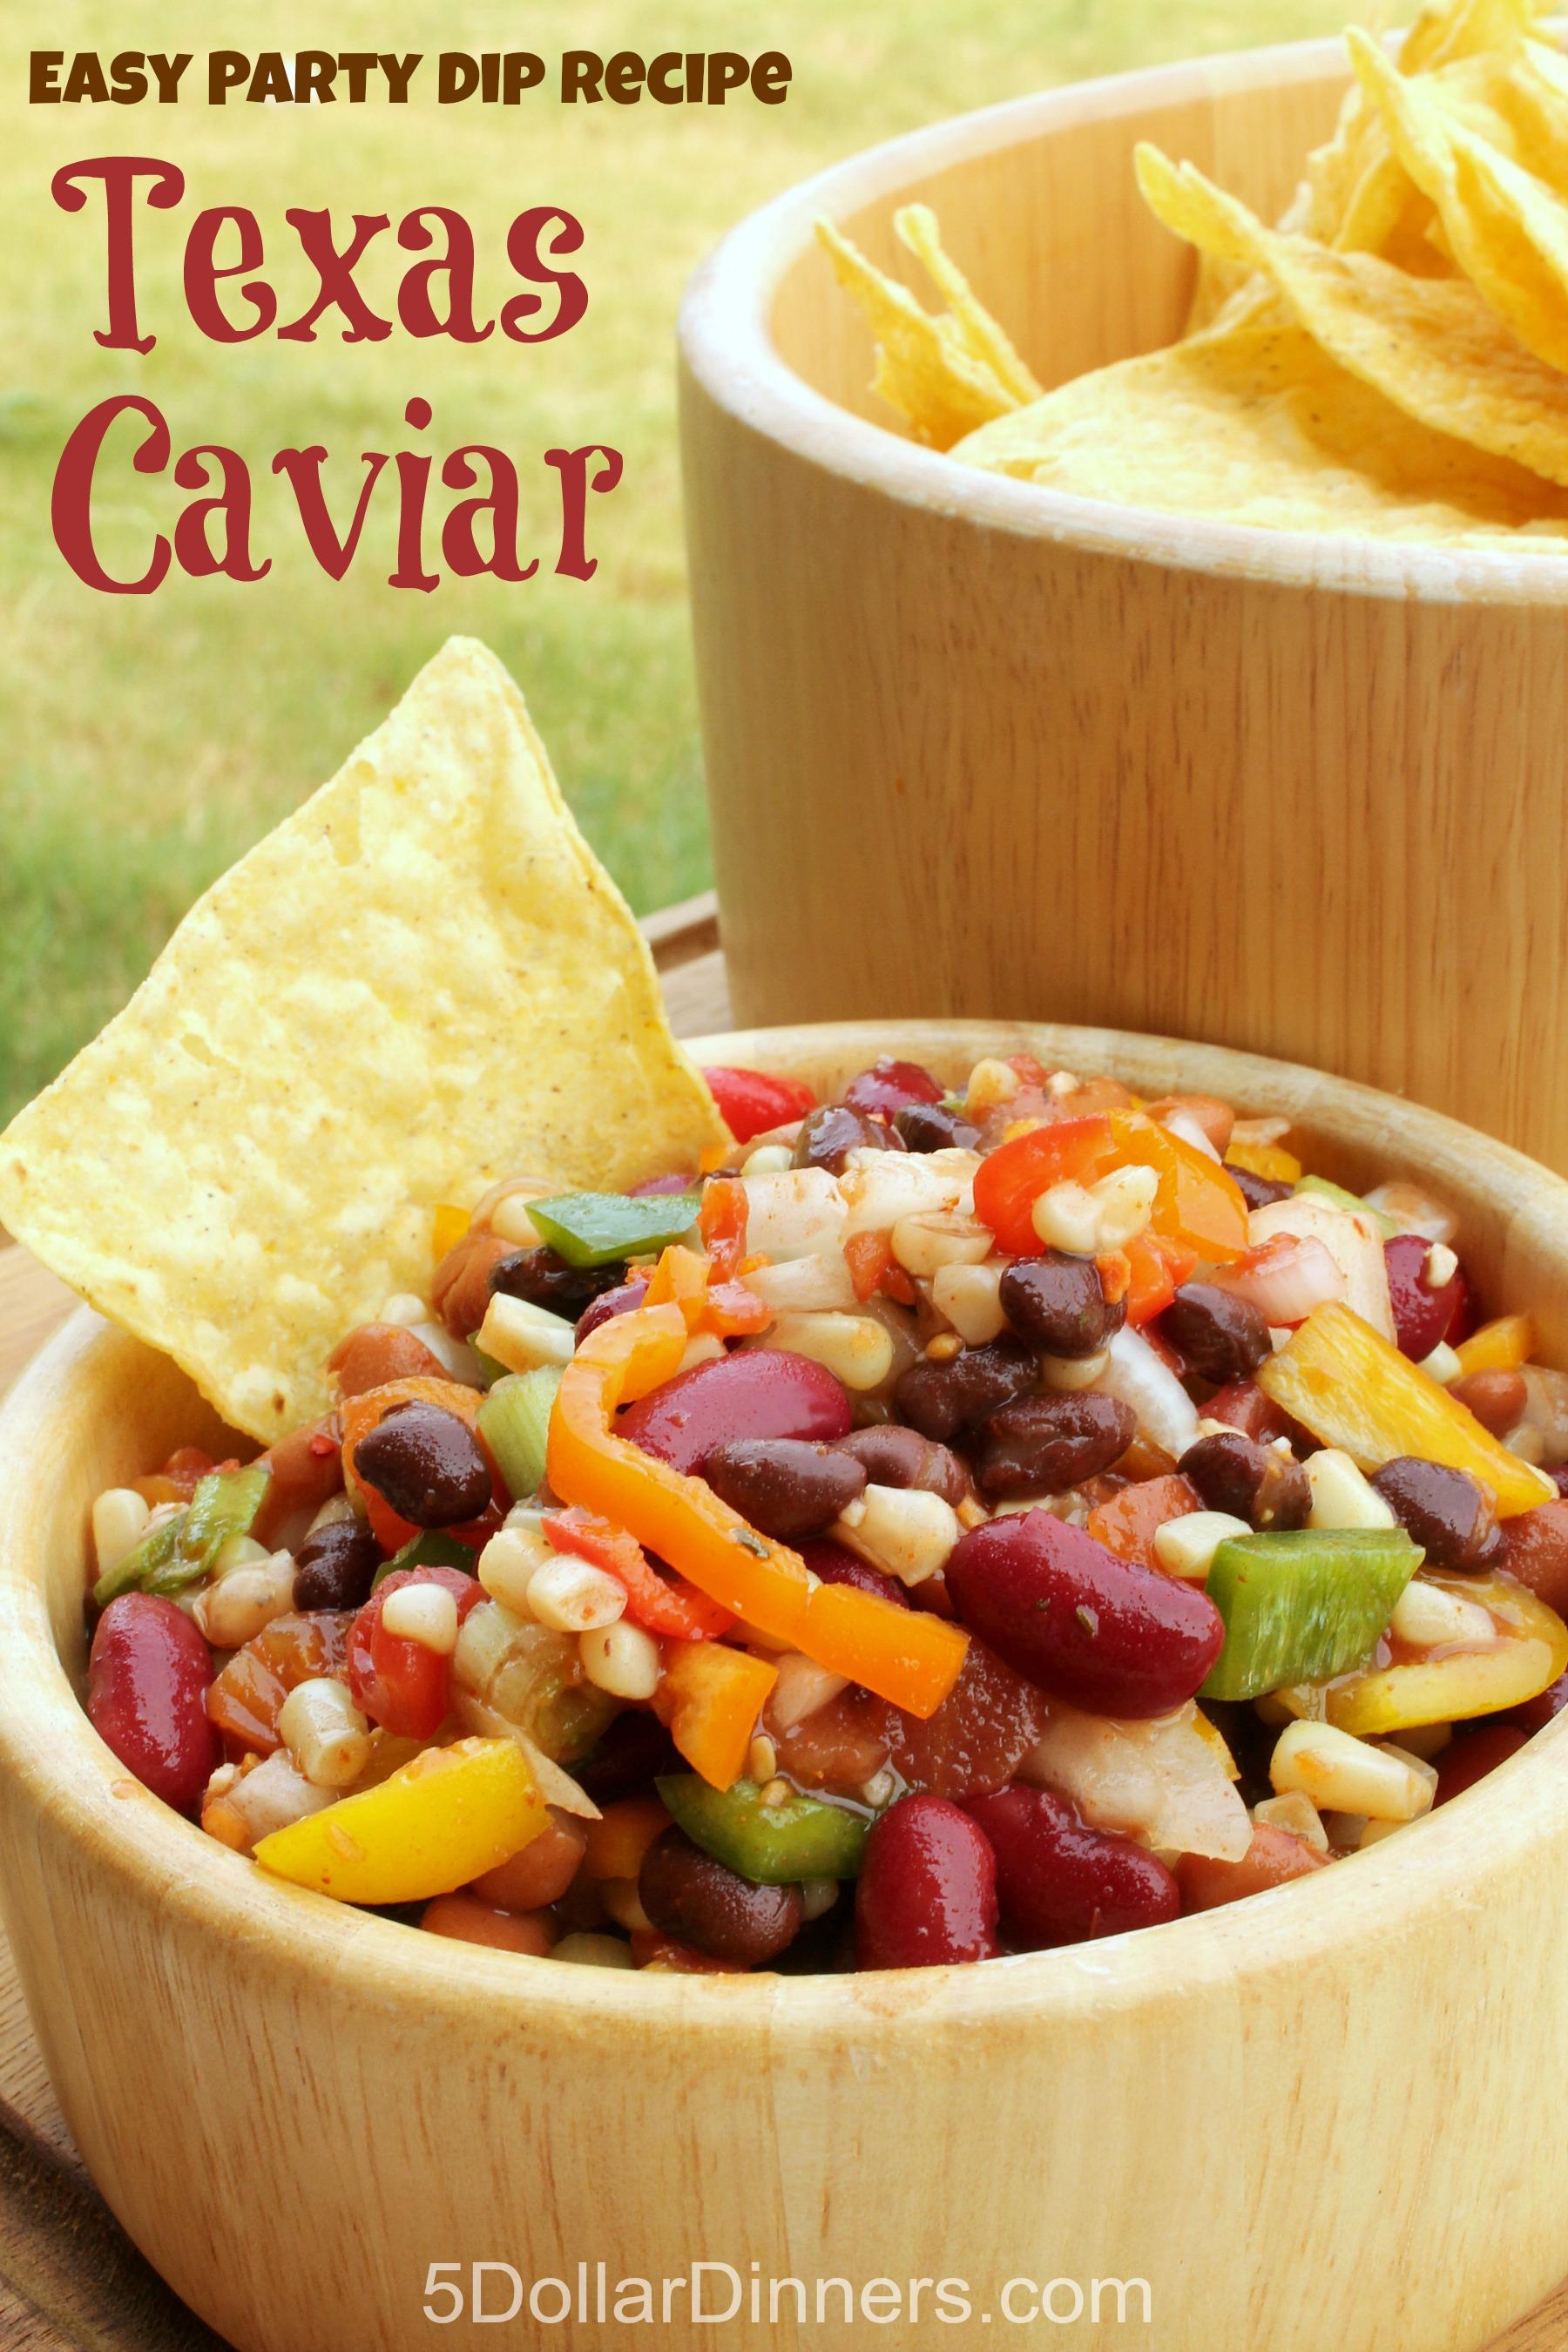 Easy Party Dip Recipe for Texas Caviar from 5DollarDinners.com